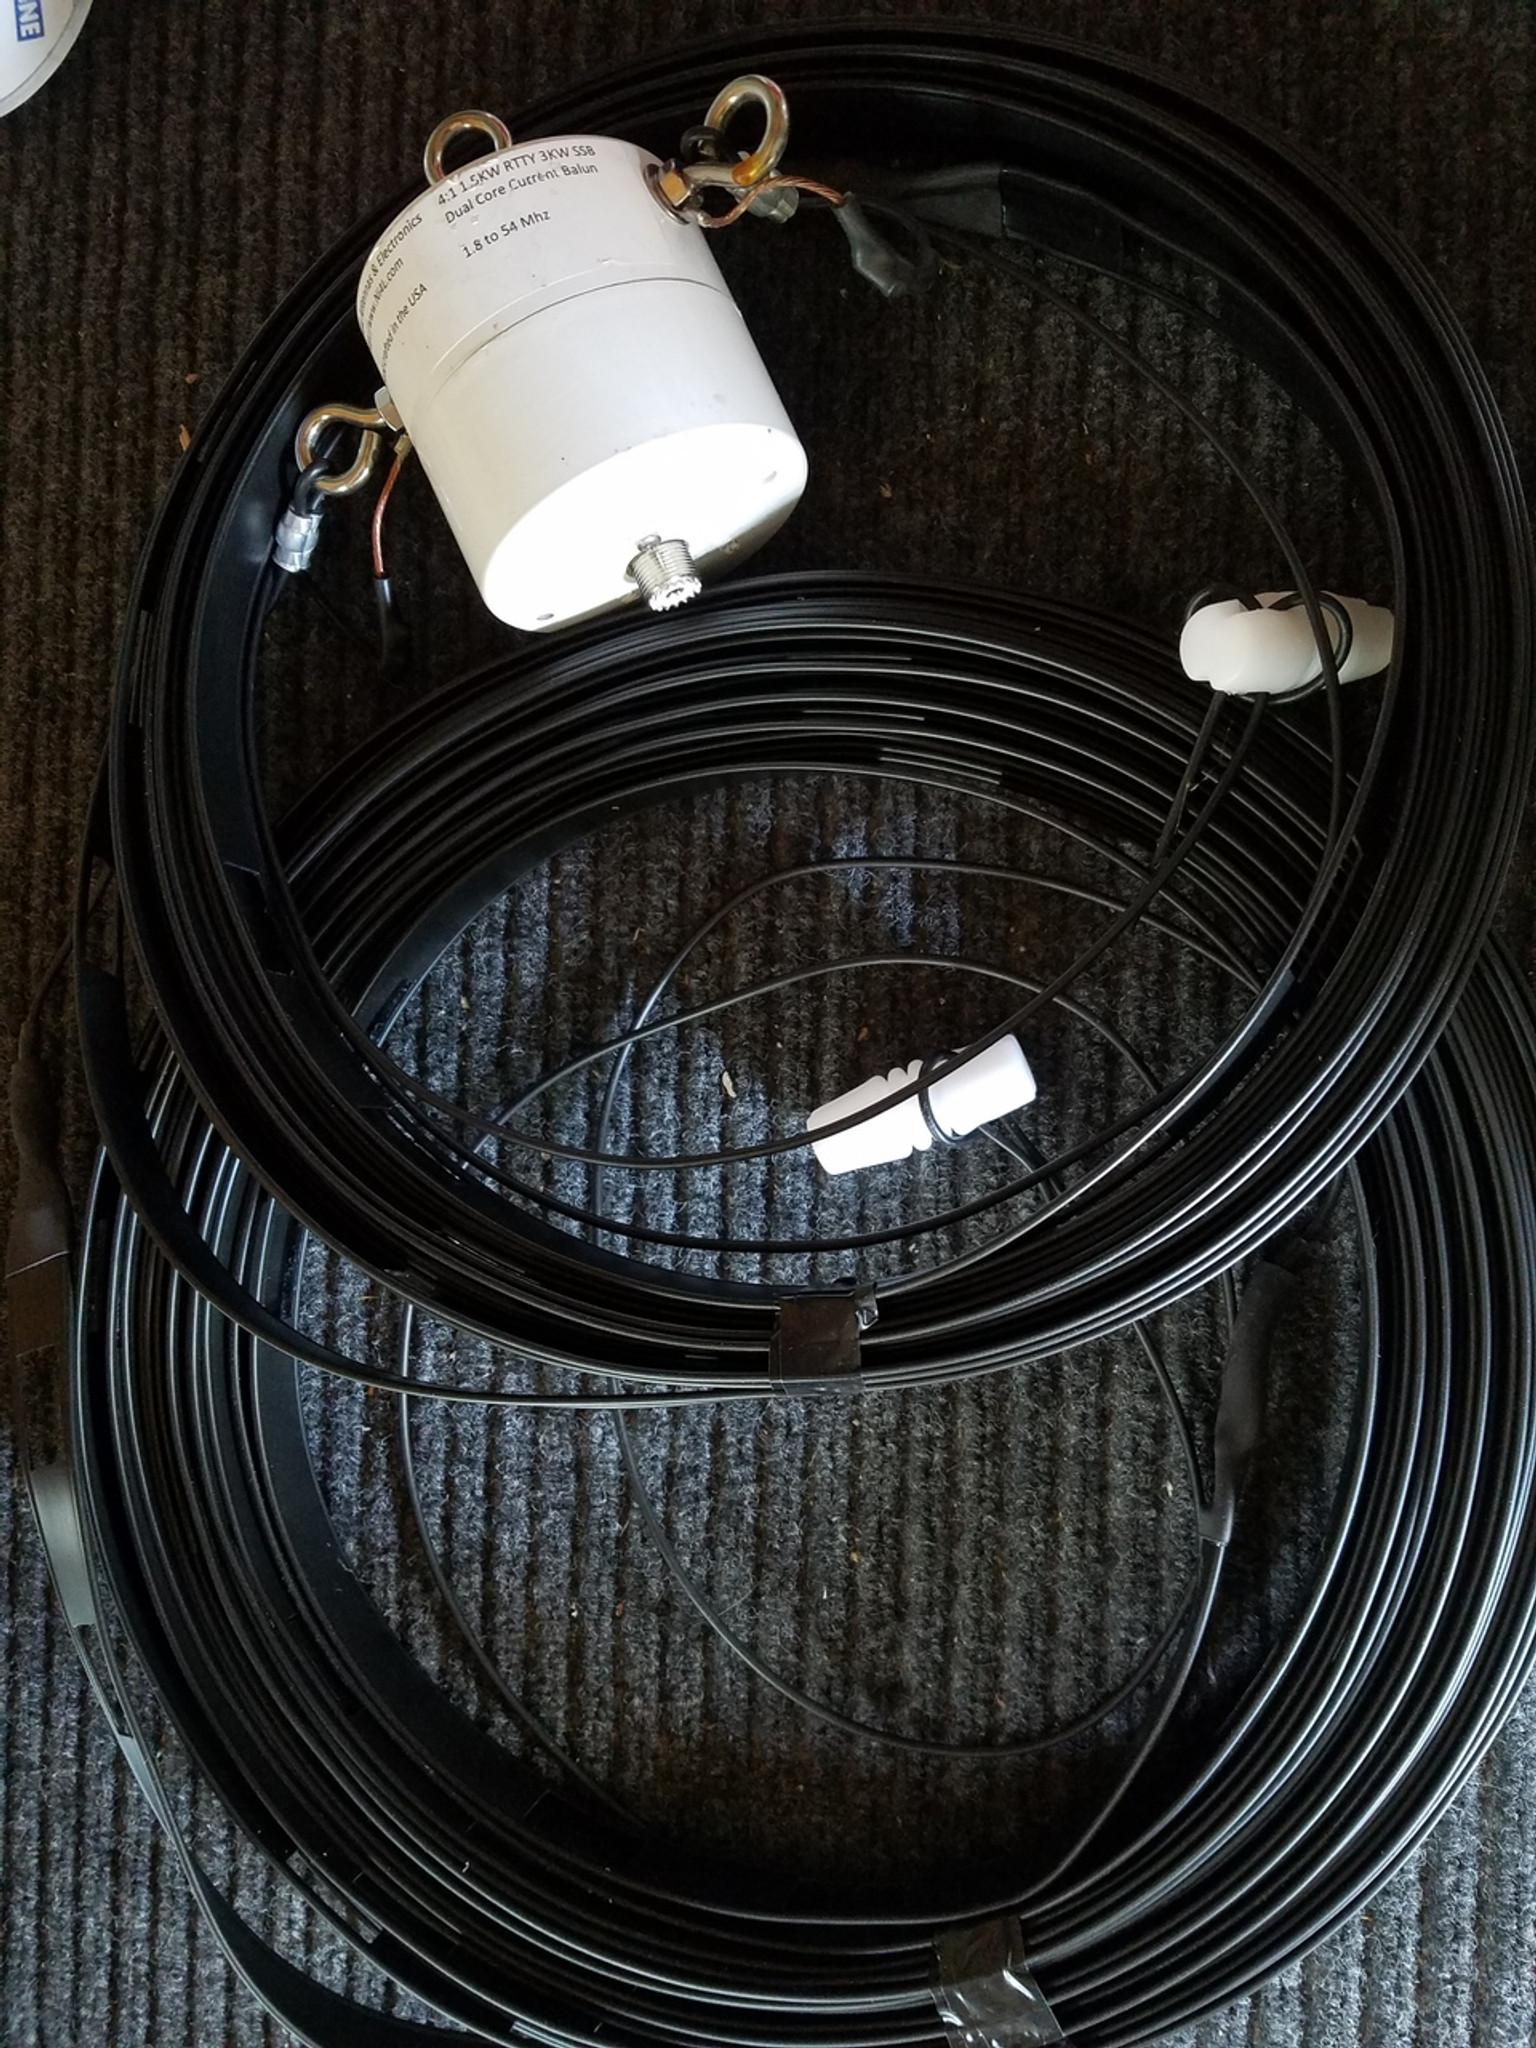 10 Meter band Half Wave Antenna  1:1 Balun Dipole HF Flex-Weave Unadilla W2AU